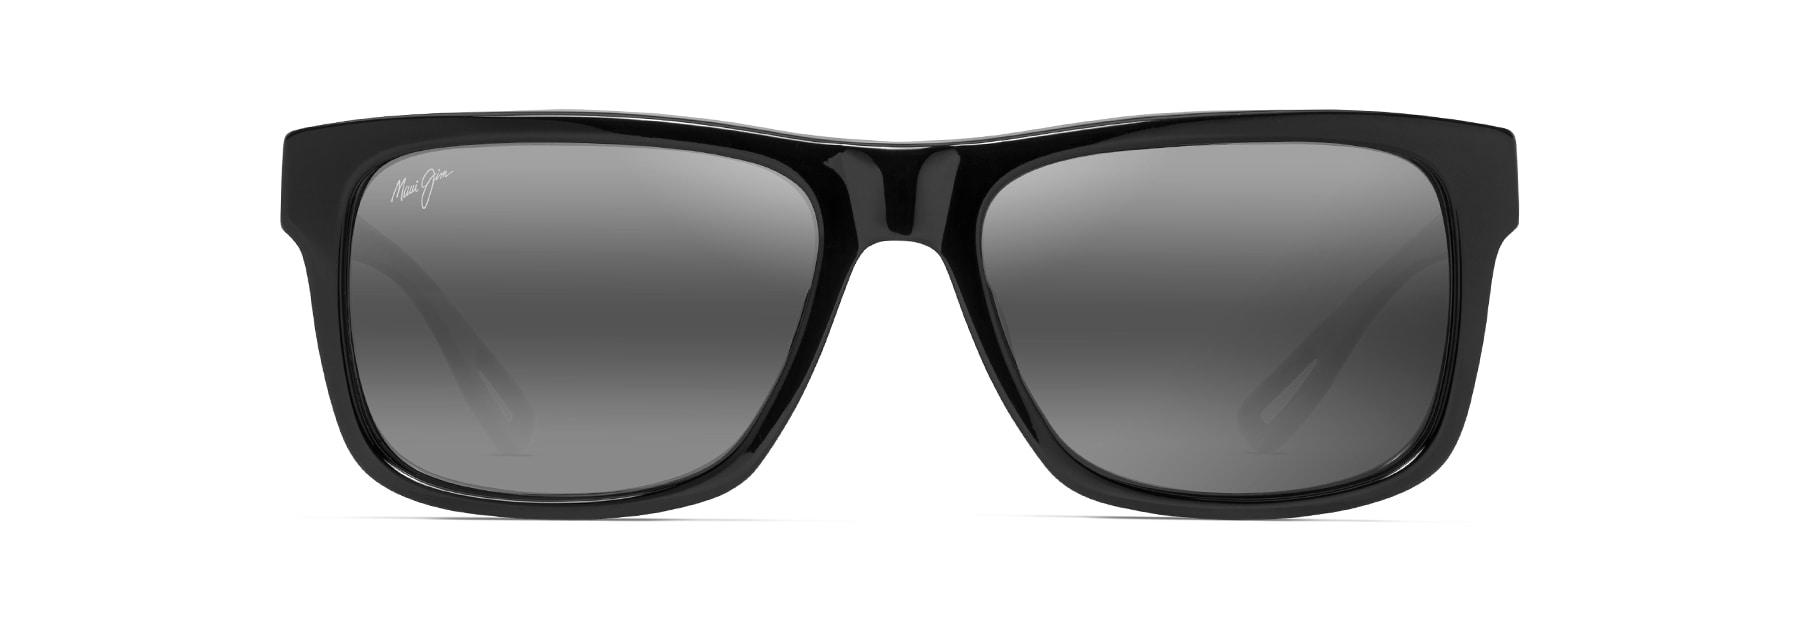 5fbdcab5f634b Chee Hoo! Polarized Sunglasses